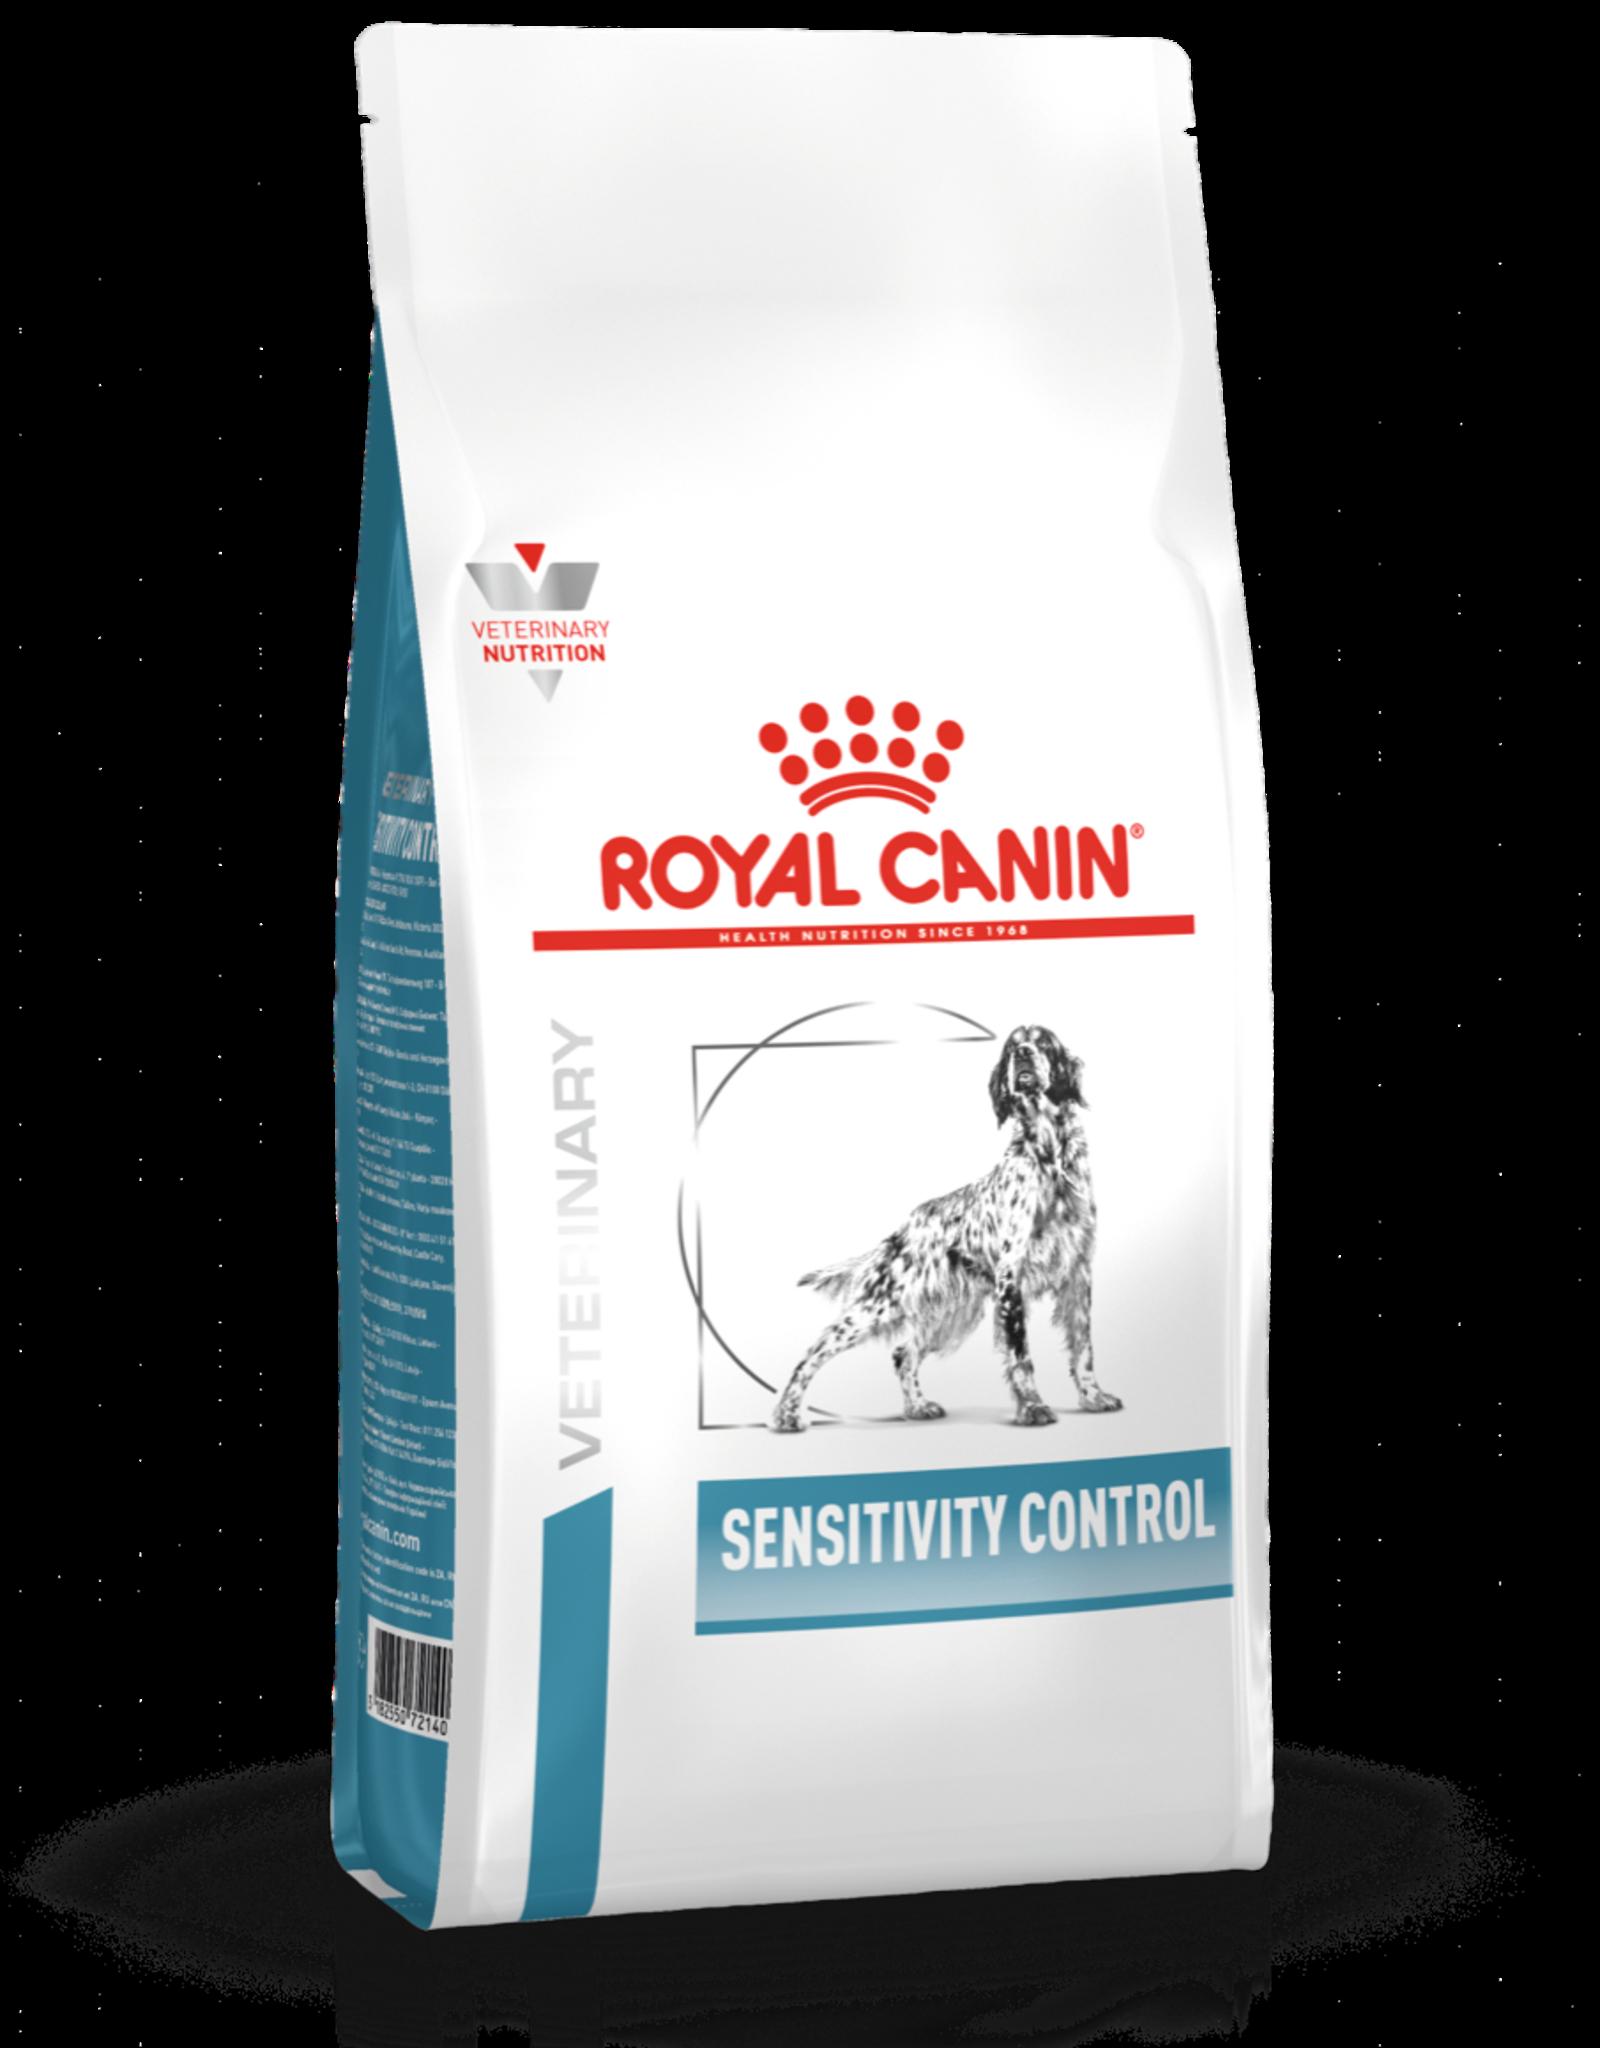 Royal Canin Royal Canin Sensitivity Control Dog Duck 7kg